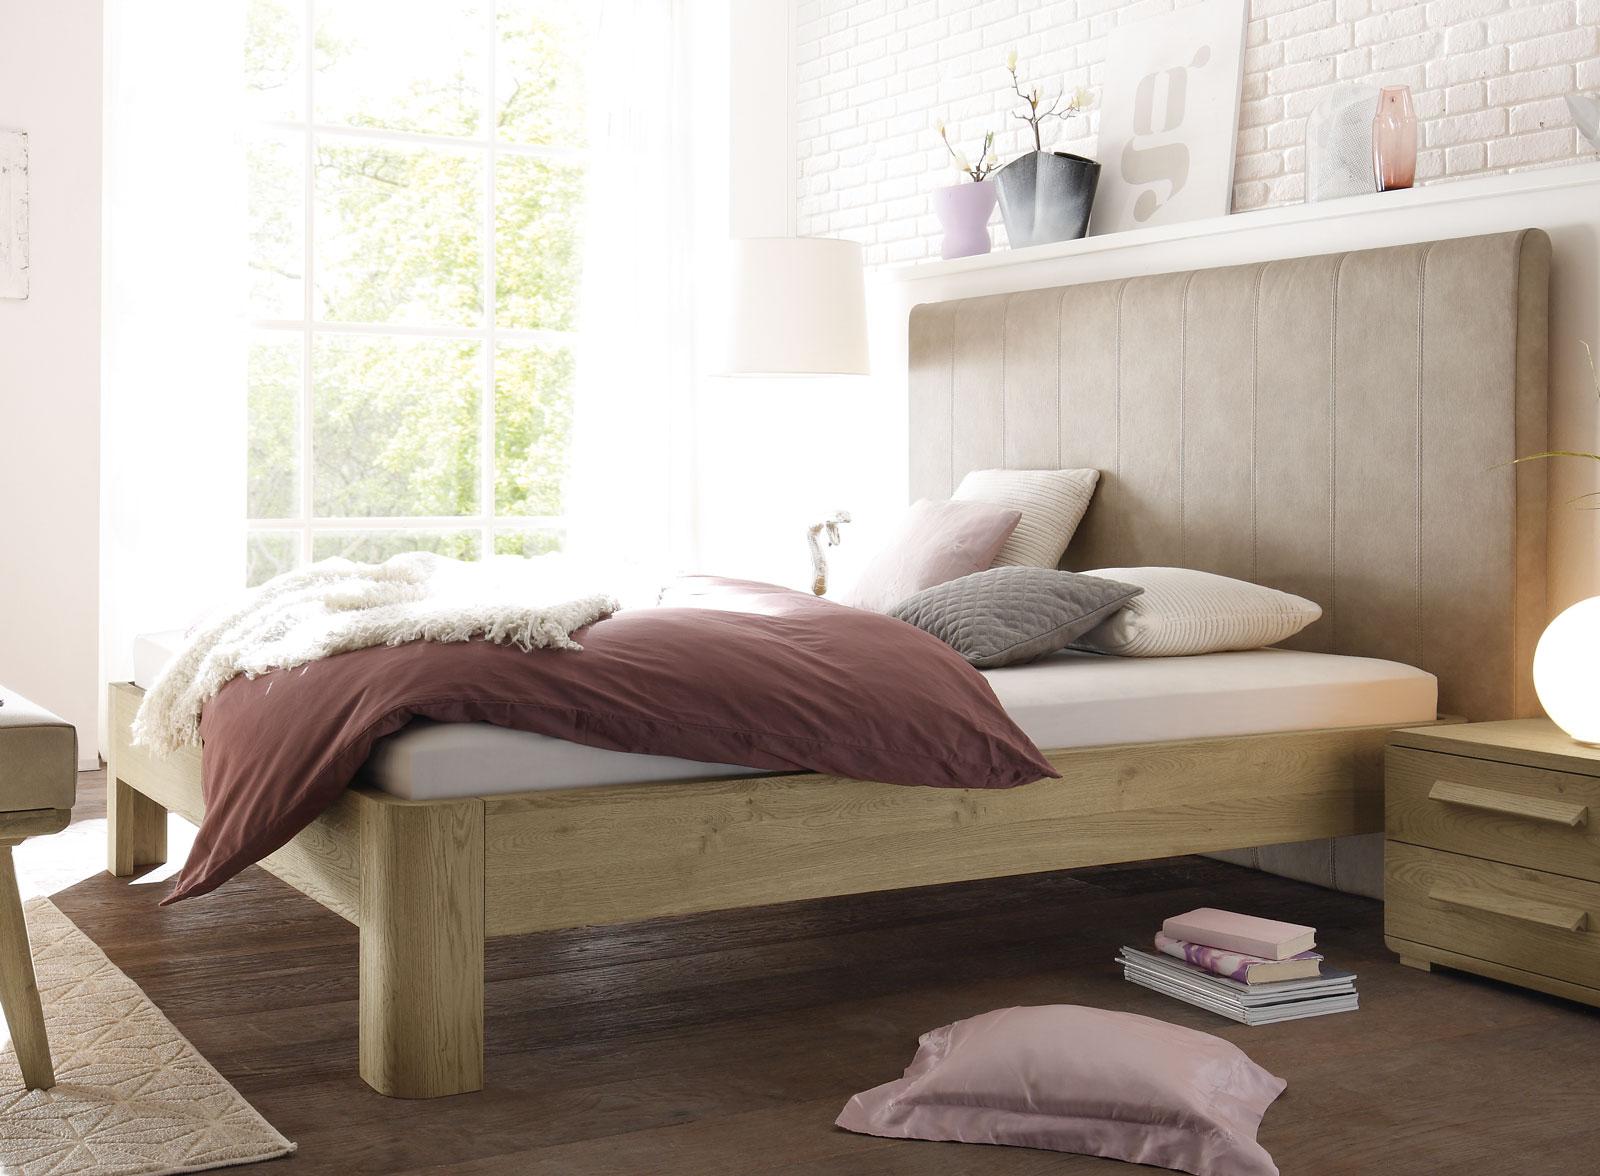 massivholzbett aus eiche ge lt mit hohem wandpaneel banco. Black Bedroom Furniture Sets. Home Design Ideas